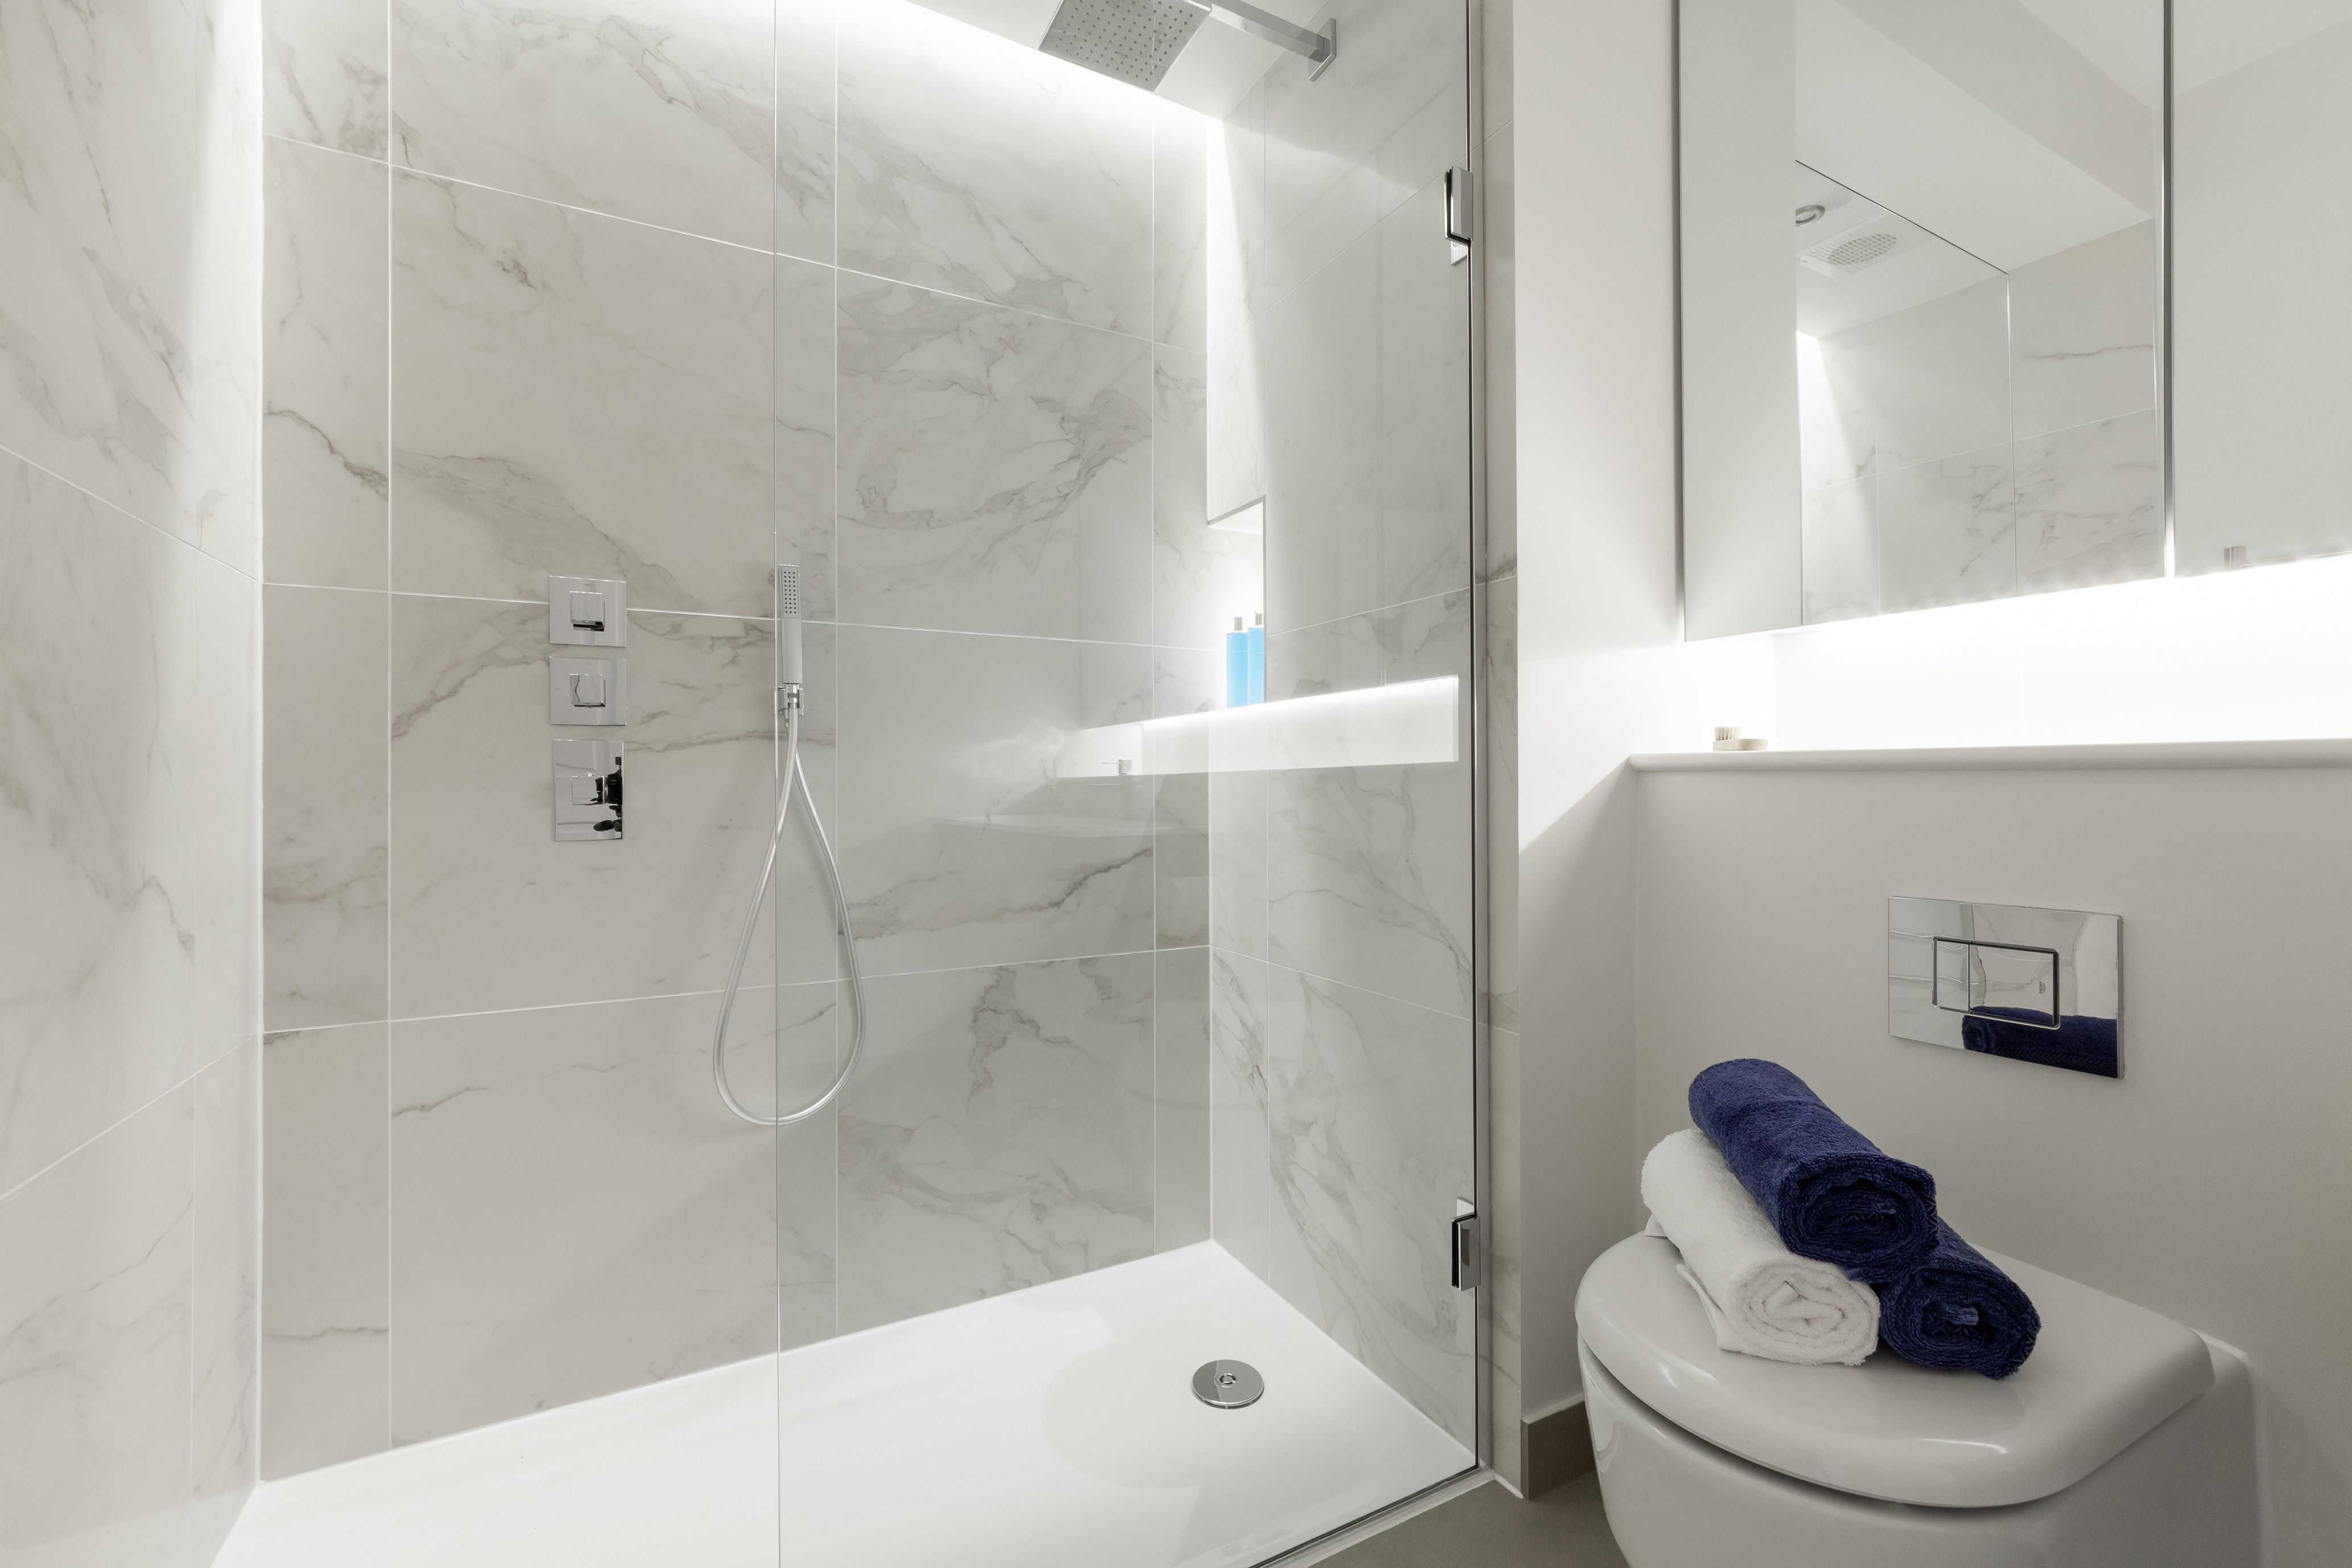 Duomo White Marble Effect Porcelain Tiles From The Stone Ceramic Warehouse Bathroom Bathroomideas Bathro White Floors Bathroom Inspiration Bathroom Decor